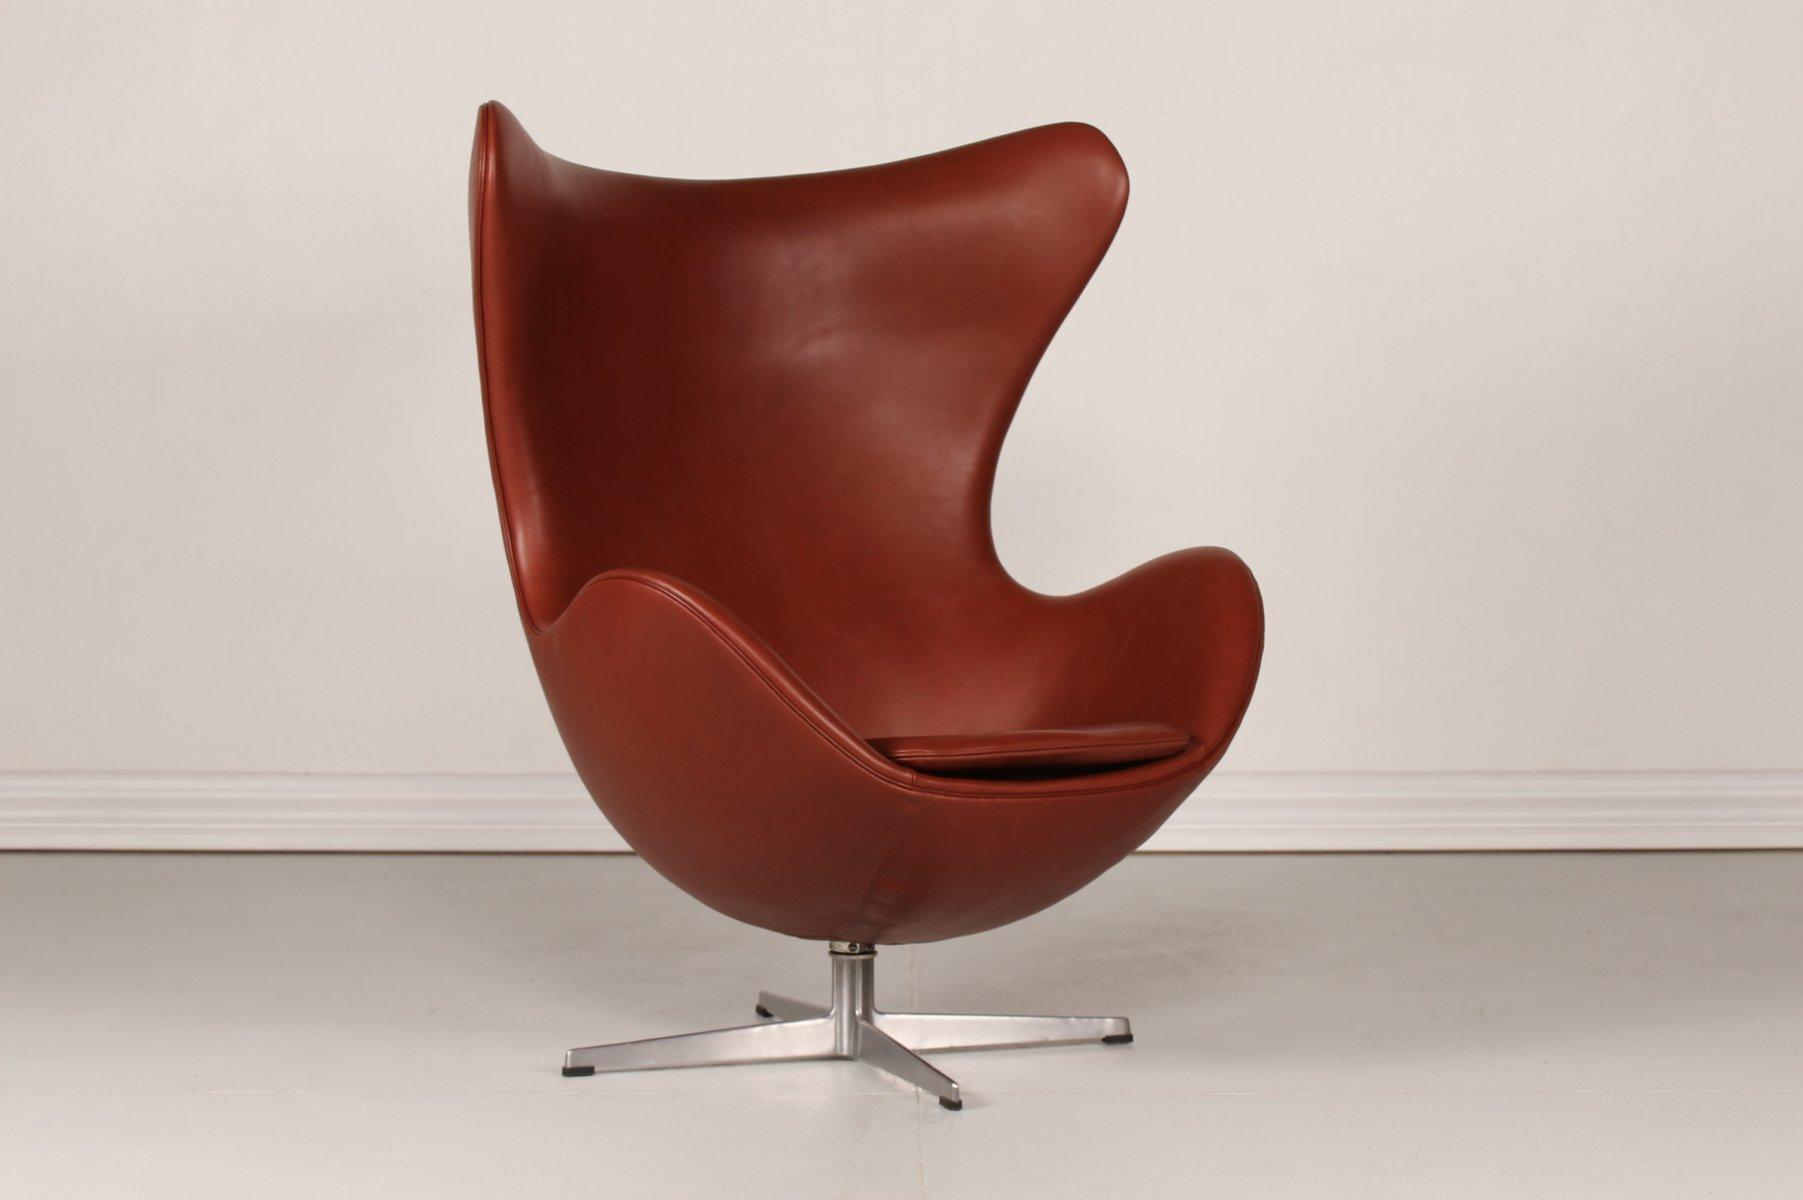 3316 Cognac Leather Egg Chair By Arne Jacobsen For Fritz Hansen 1969